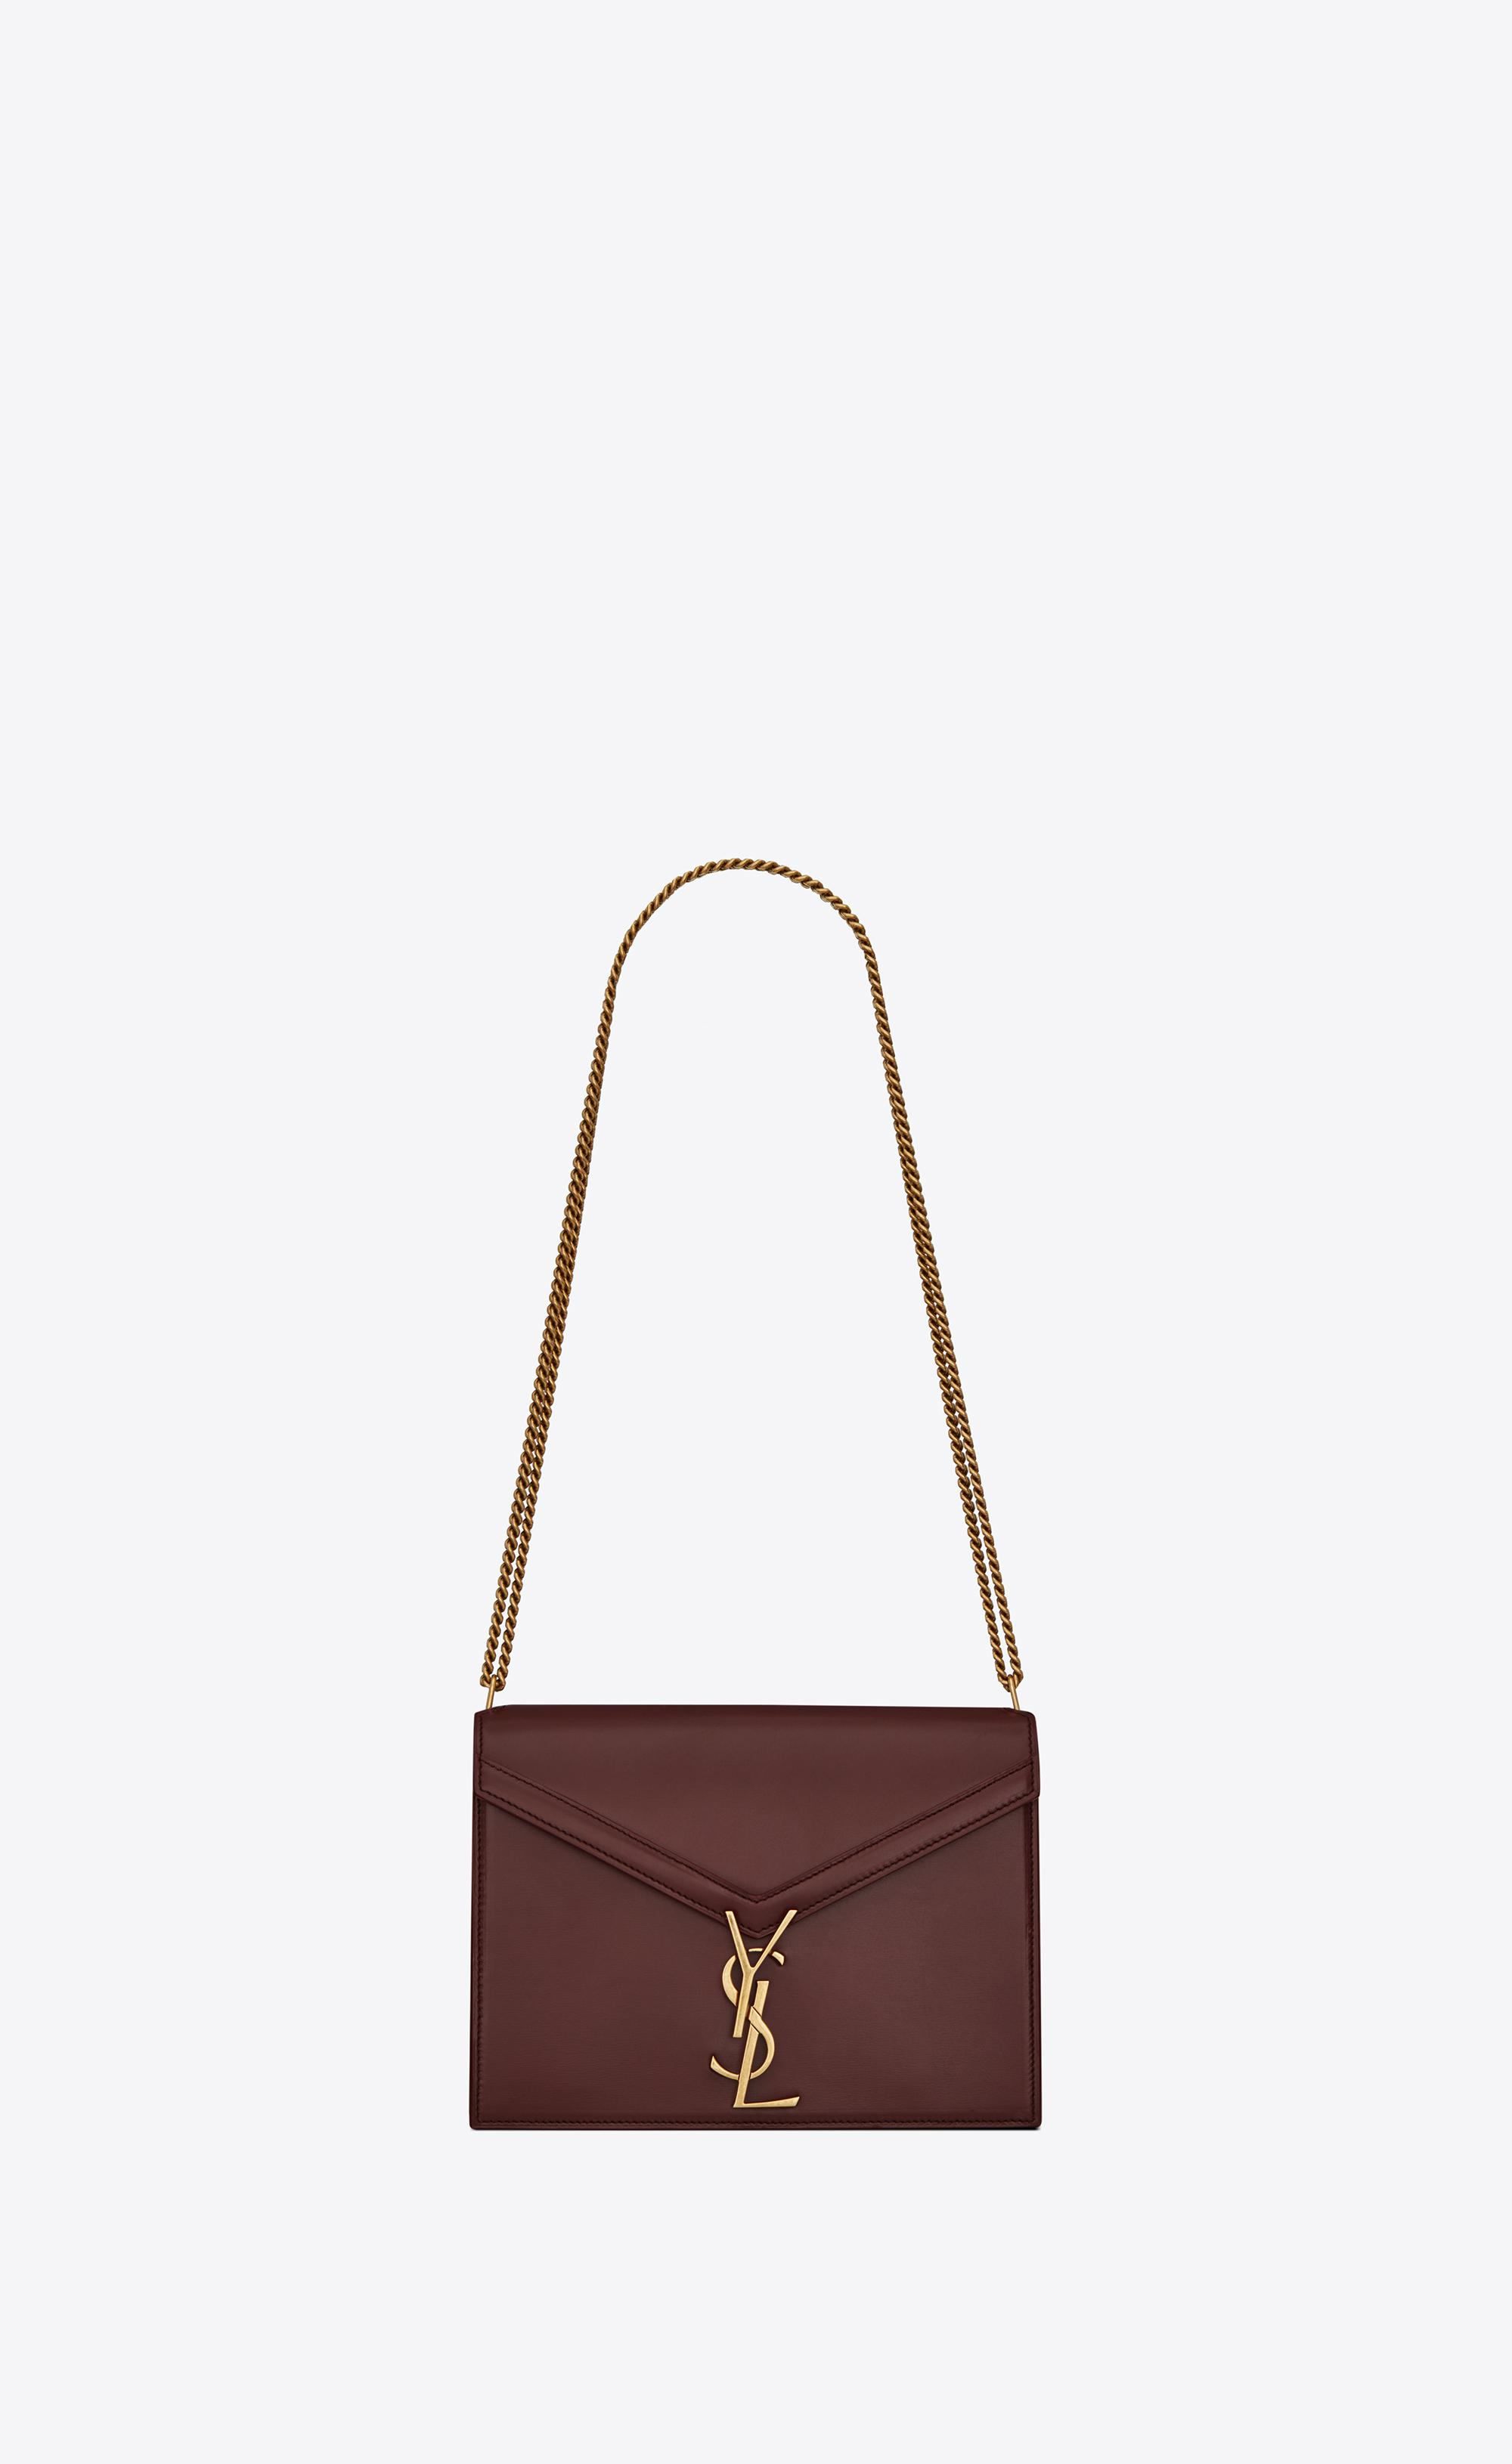 ea735756970c Saint Laurent. Women s Red Cassandra Monogram Clasp Bag In Smooth Leather